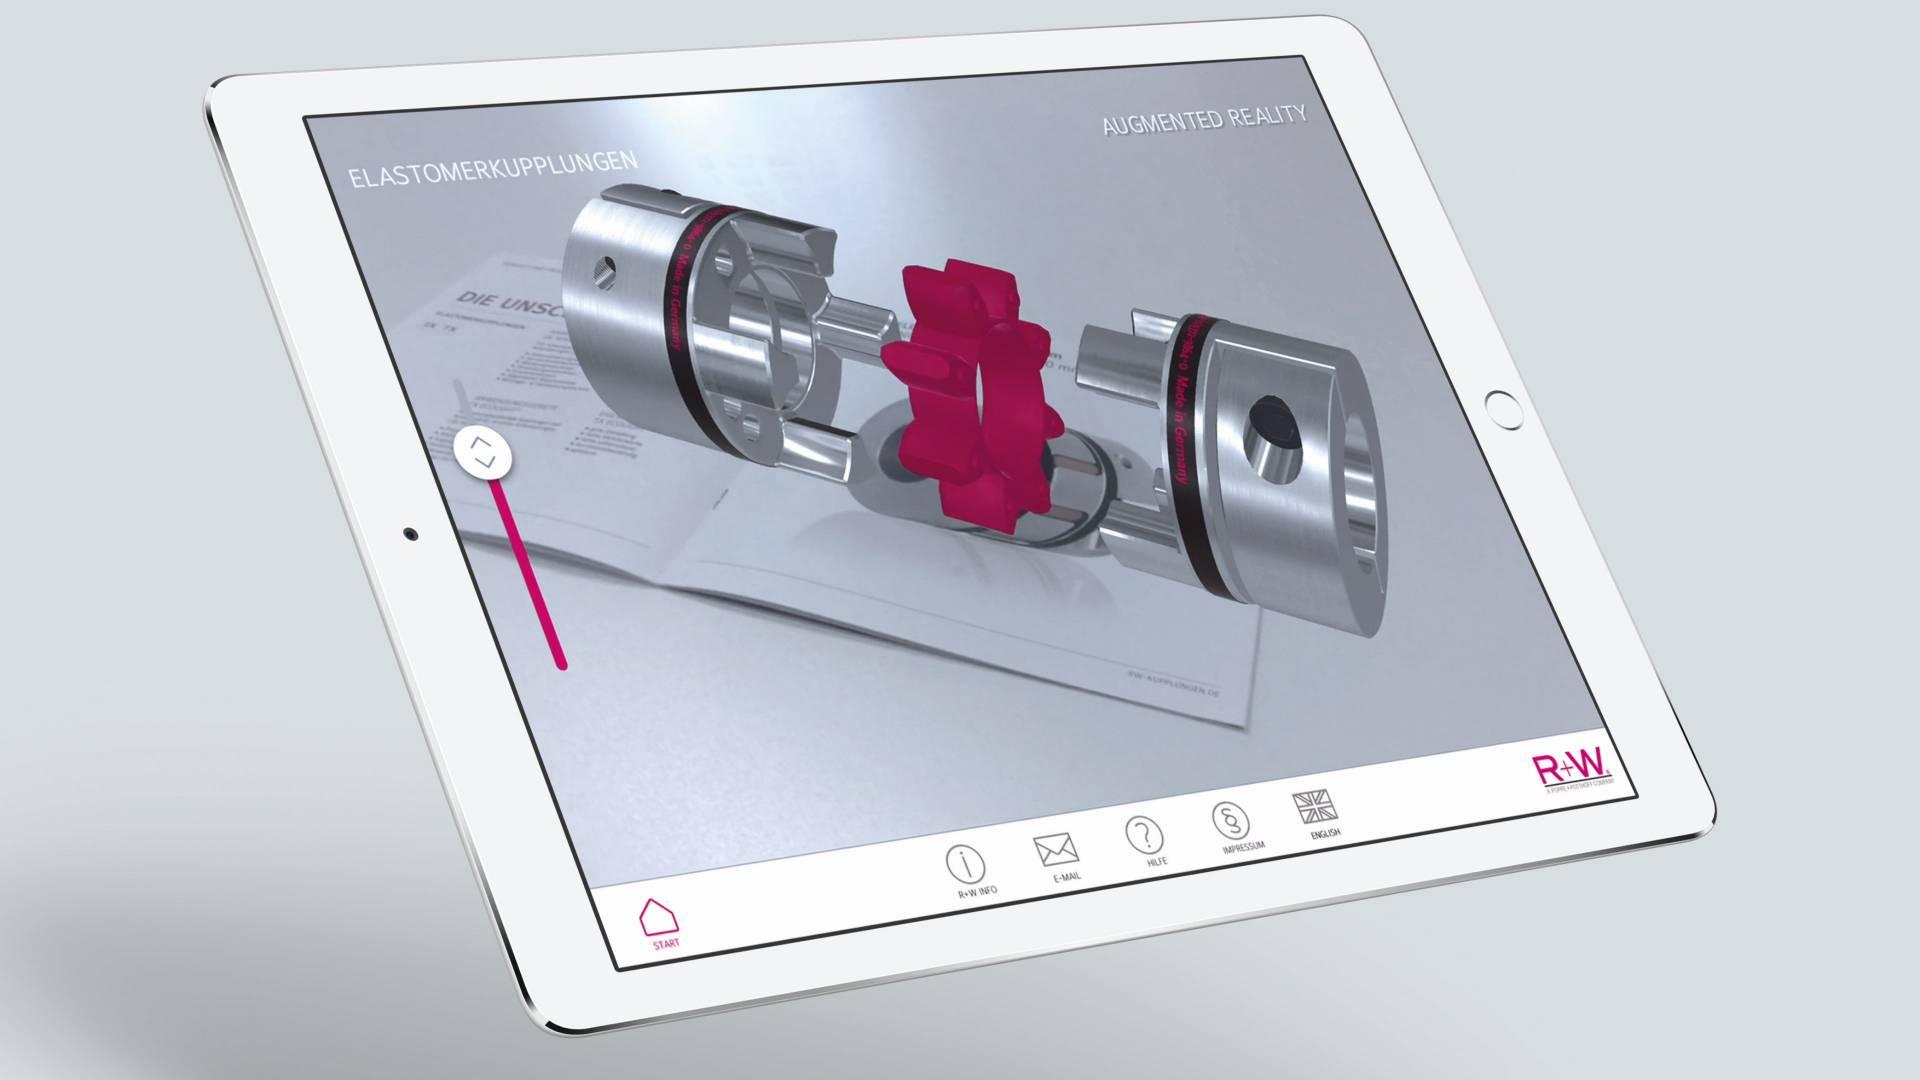 App - Augemted Reality - Industrie App - AR - Interaktiver Katalog - 3D - Unity3D - Interactive Experience - Creative Technology - realtime visions